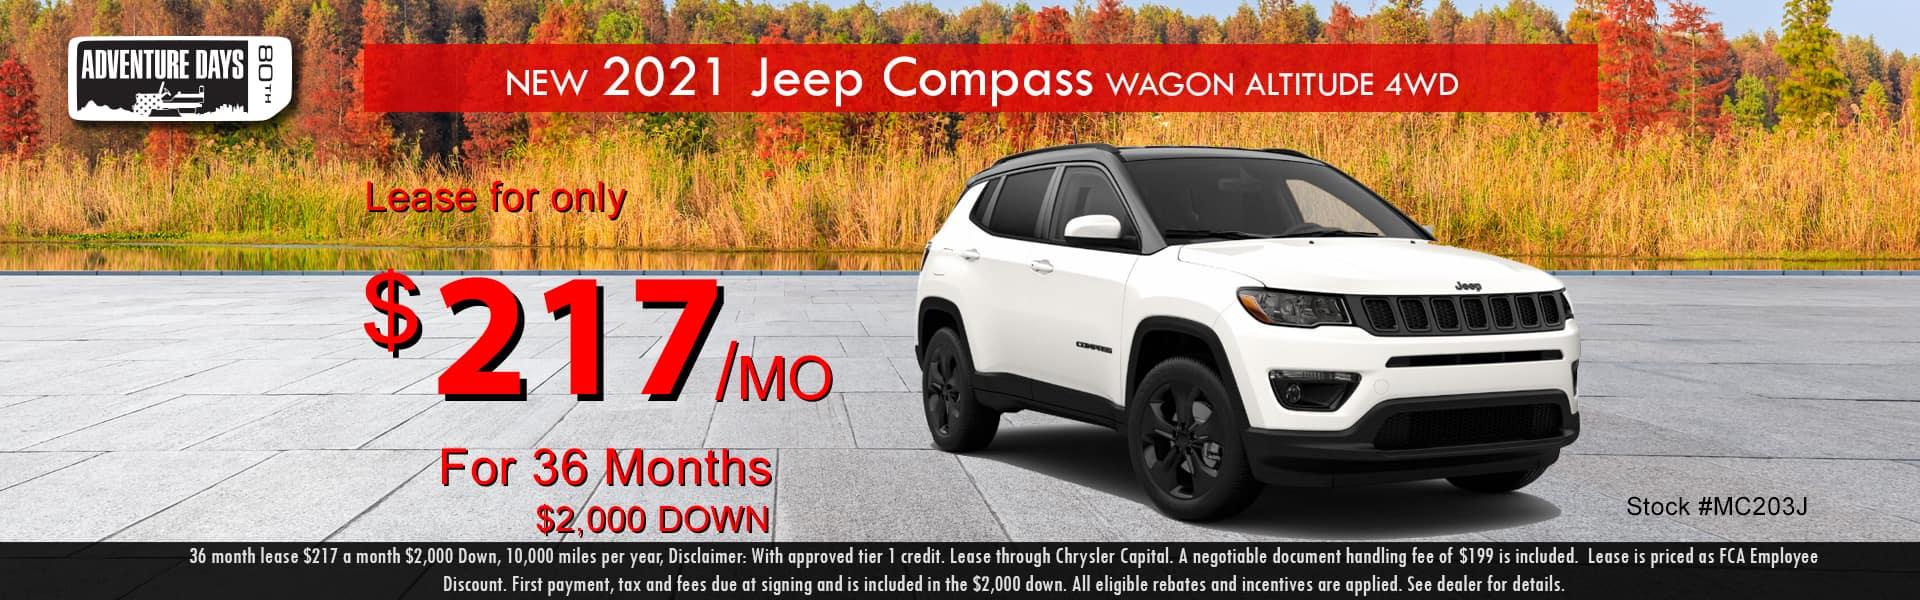 2021-Jeep-Compass-MC203J-Oct20